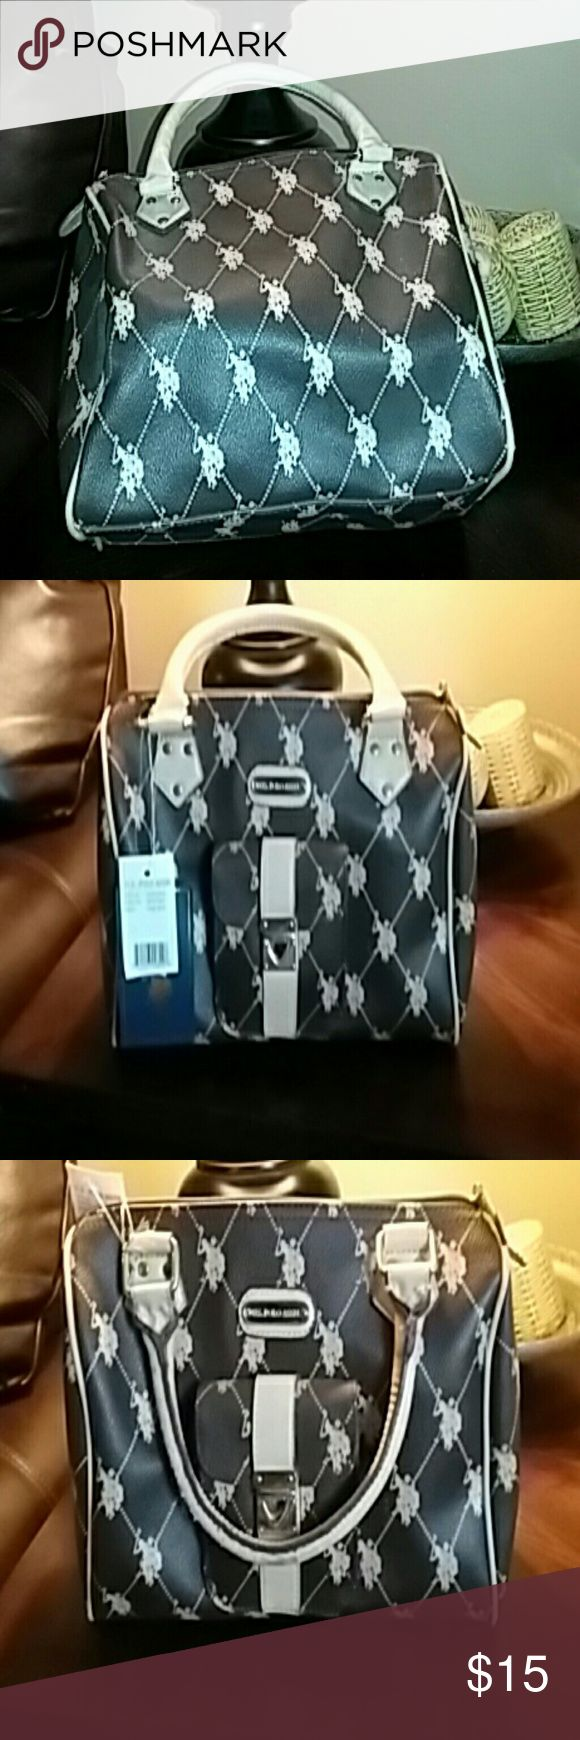 Women hand bag U.S. POLO ASSN. Mini handbag Bags Mini Bags